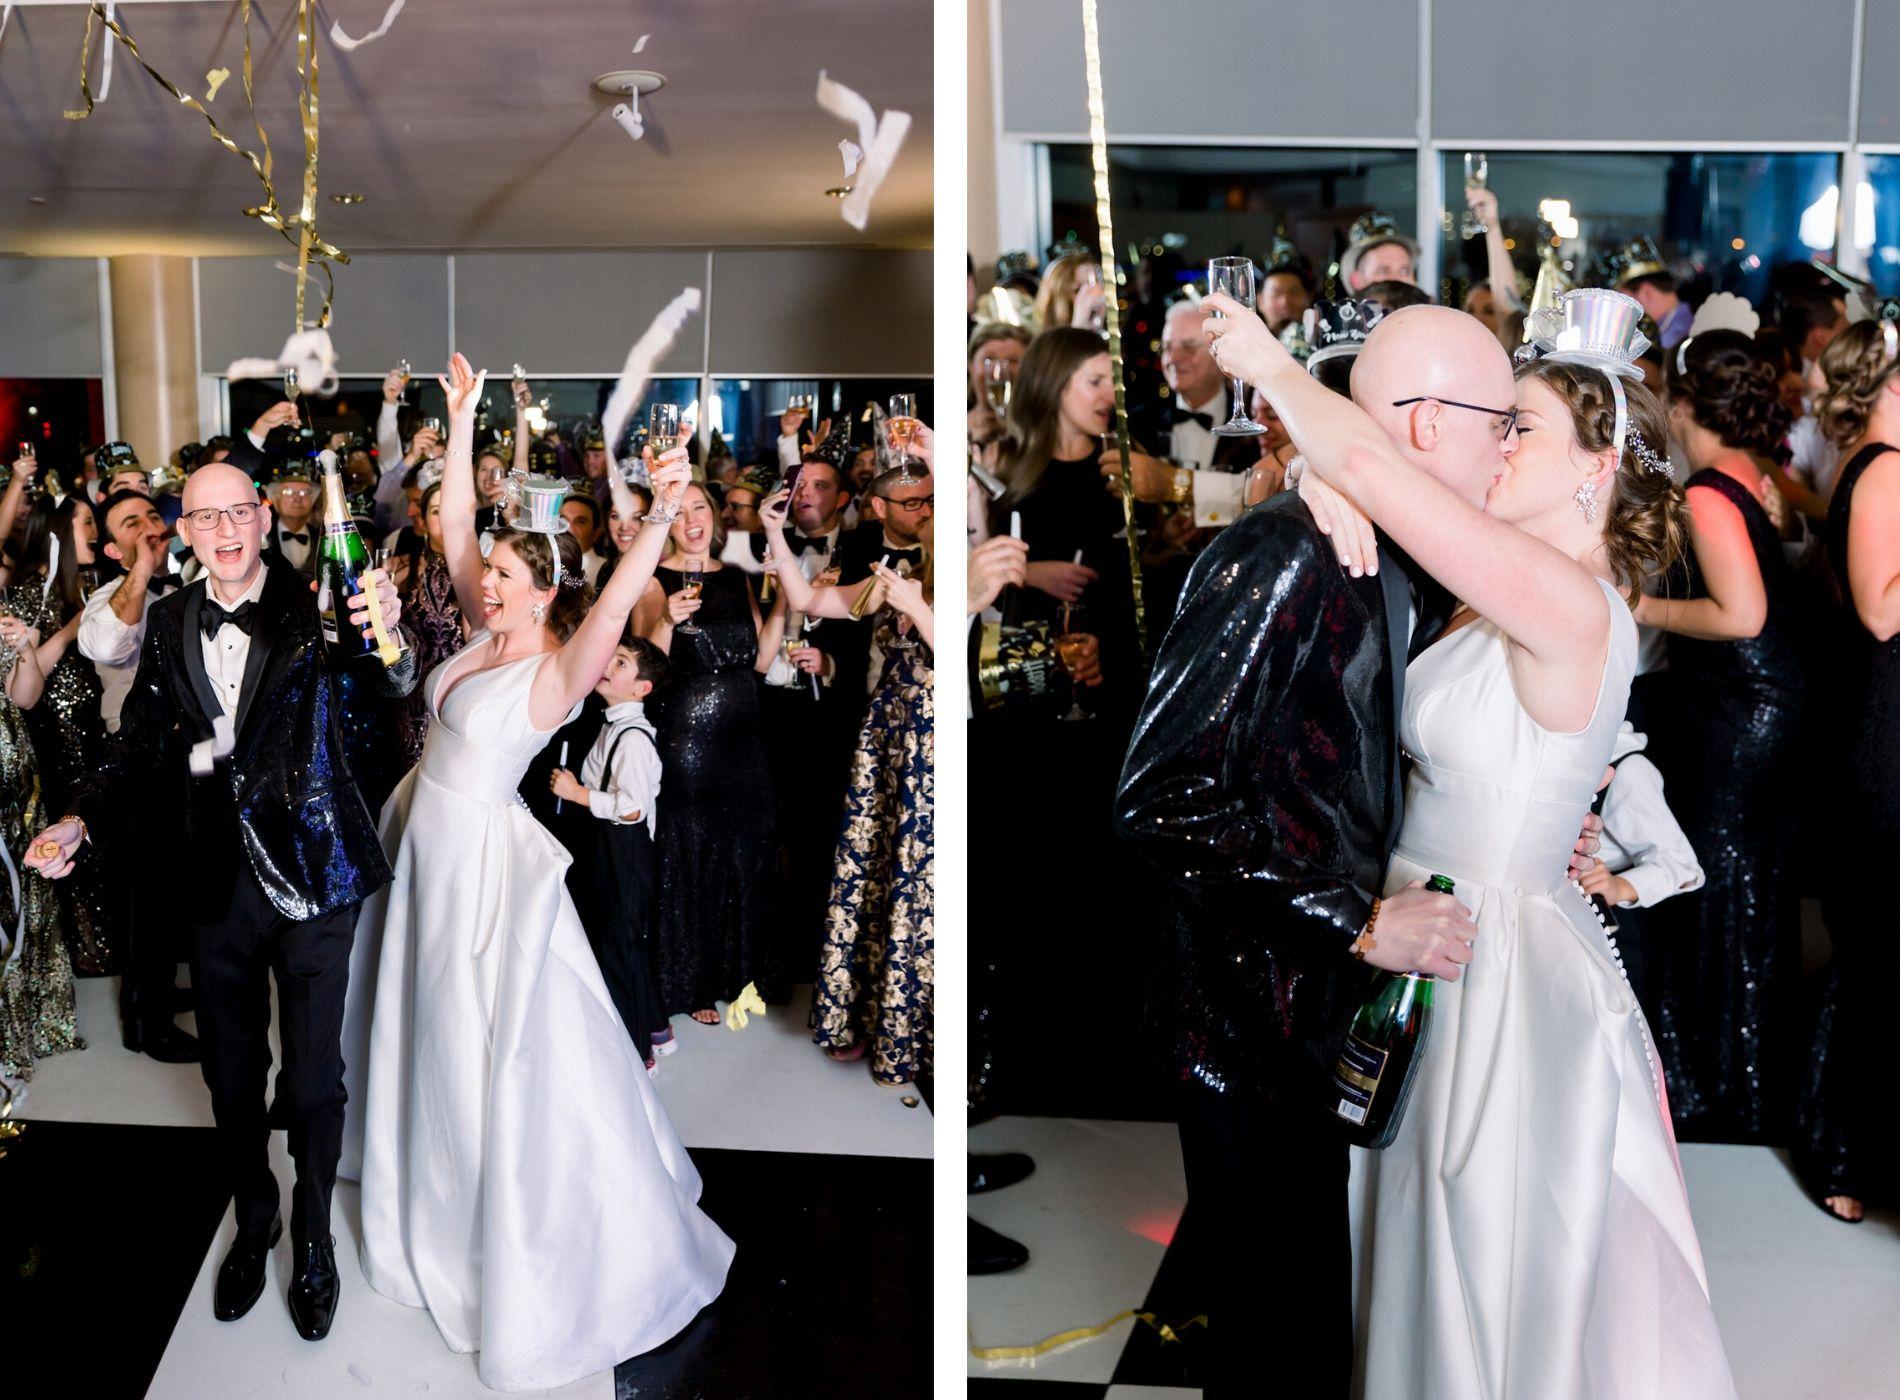 Fun New Year's Eve Wedding Midnight Kiss Portrait, Confetti and Champagne | Wedding Photographer Shauna and Jordon Photography | Tampa Bay Wedding Planner UNIQUE Weddings + Events | Wedding DJ Grant Hemond & Associates